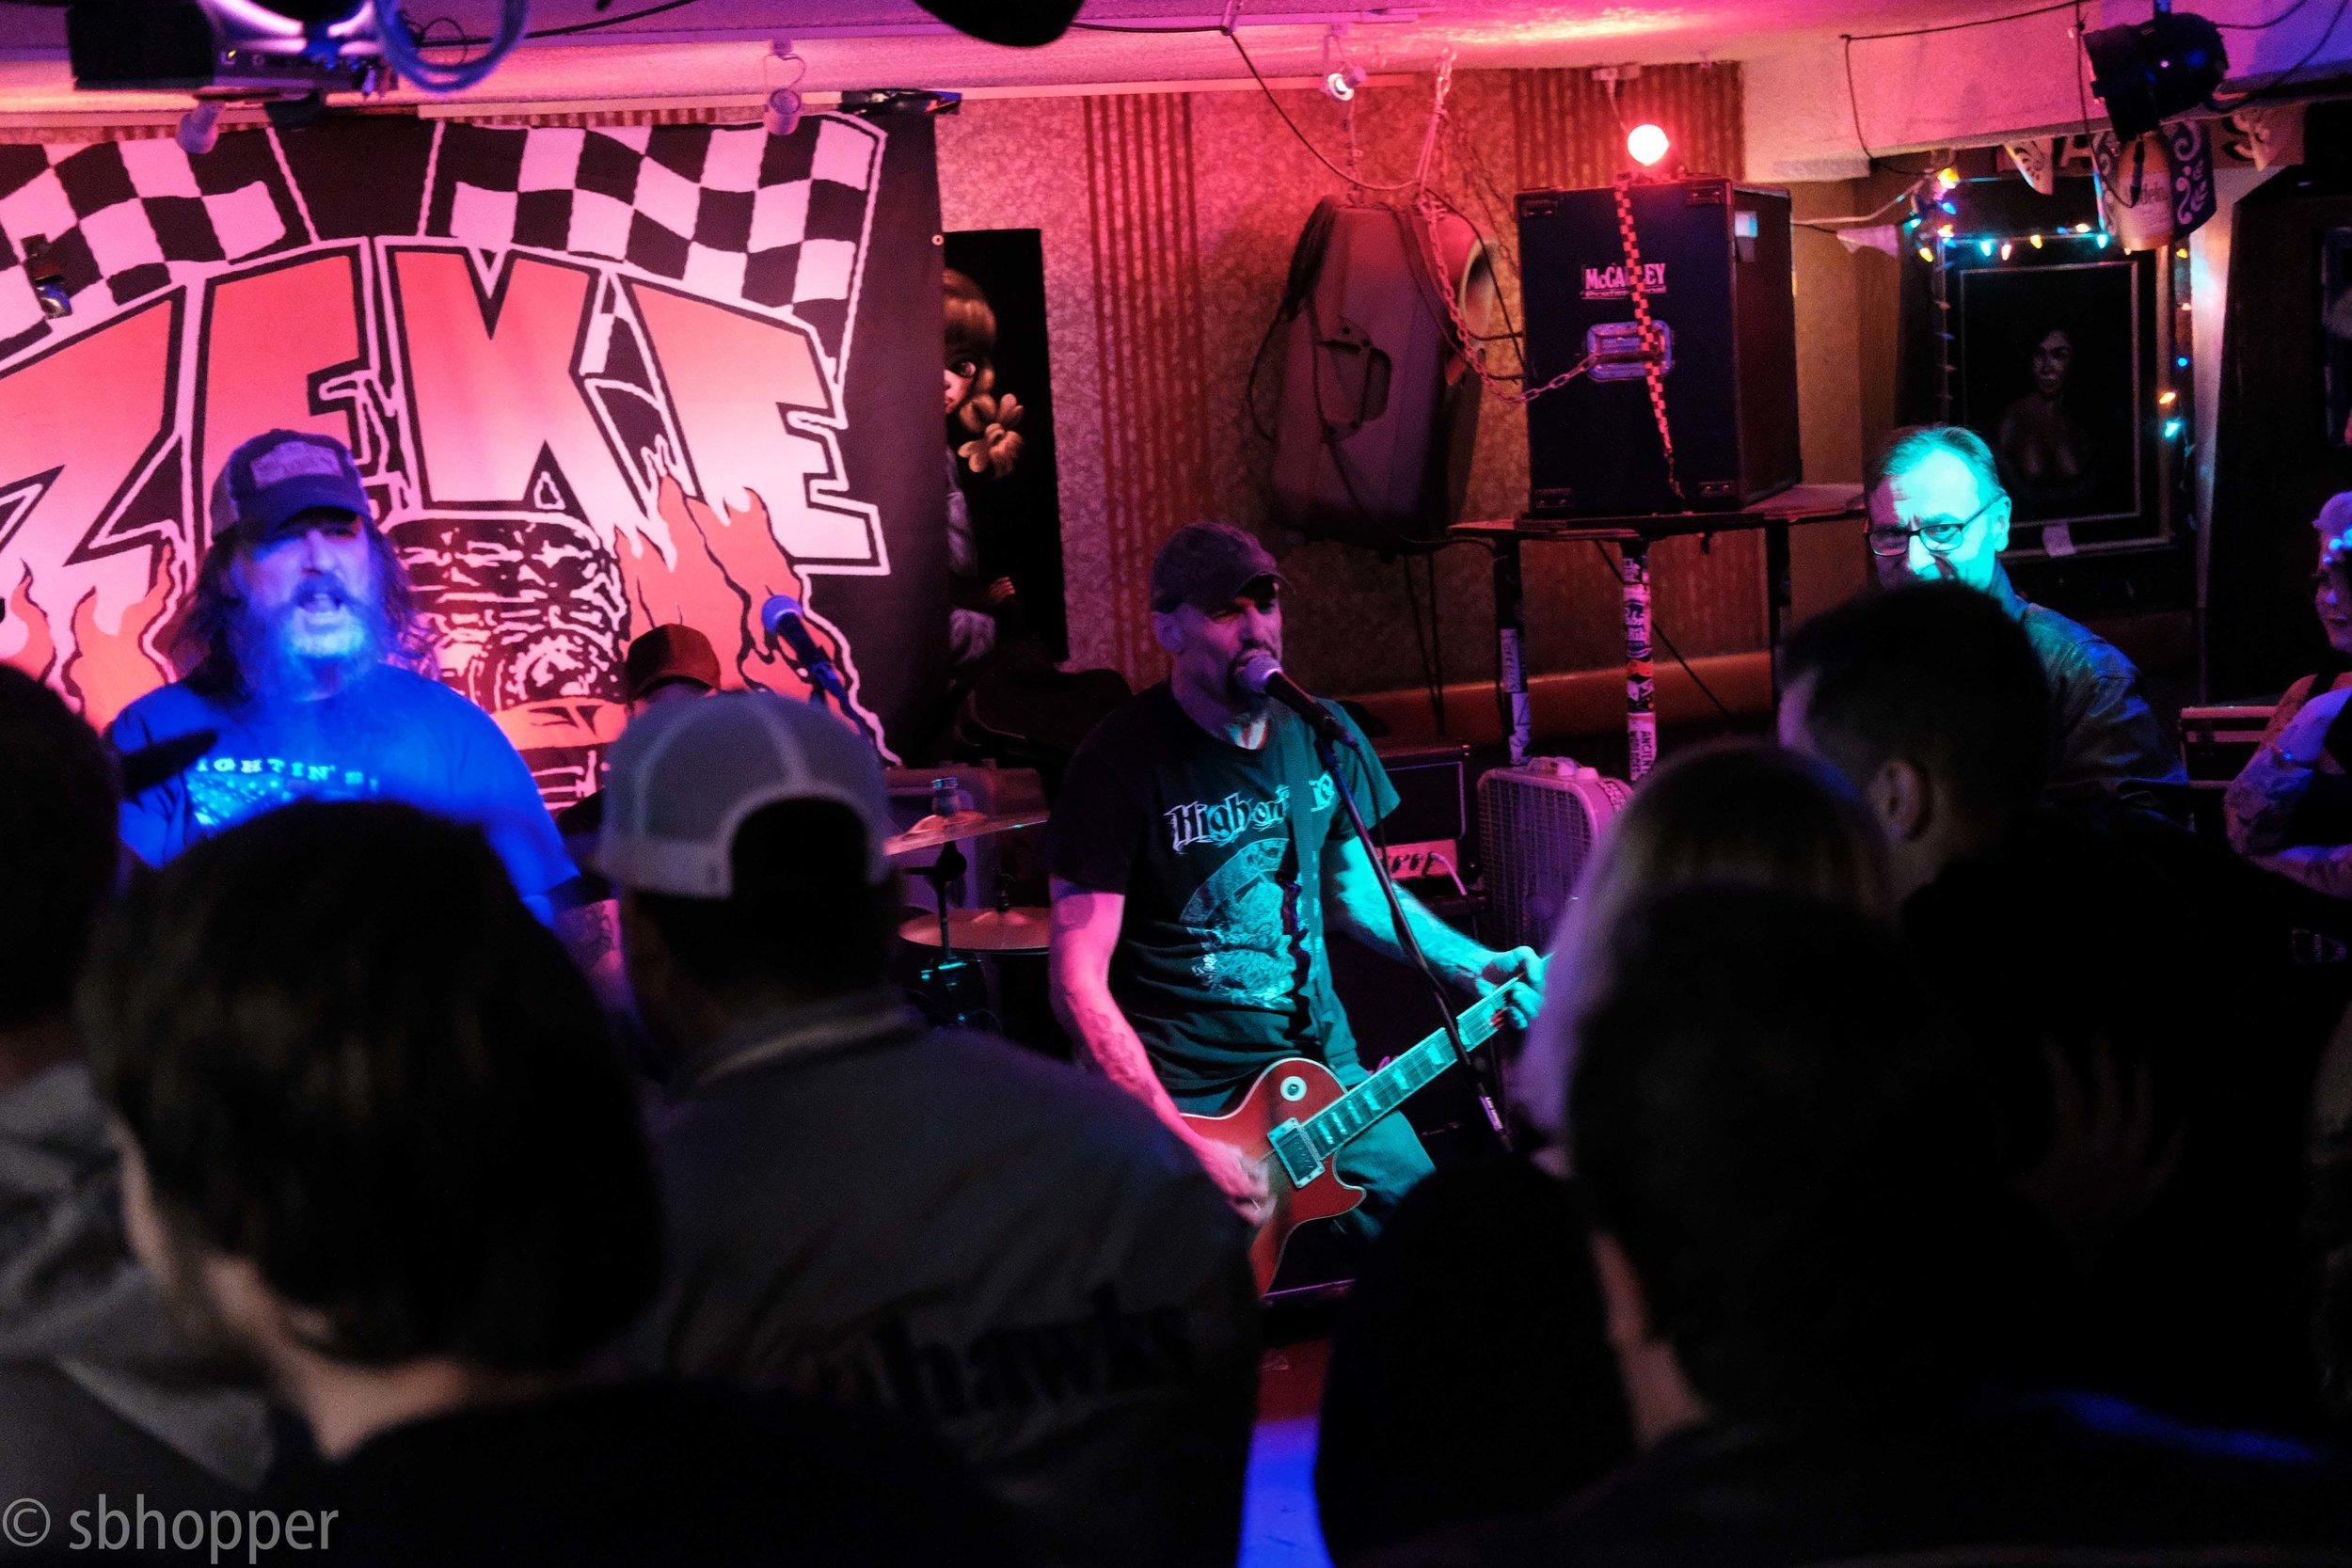 Zeke at Darrell's Tavern, Shoreline, 10 February 2018.